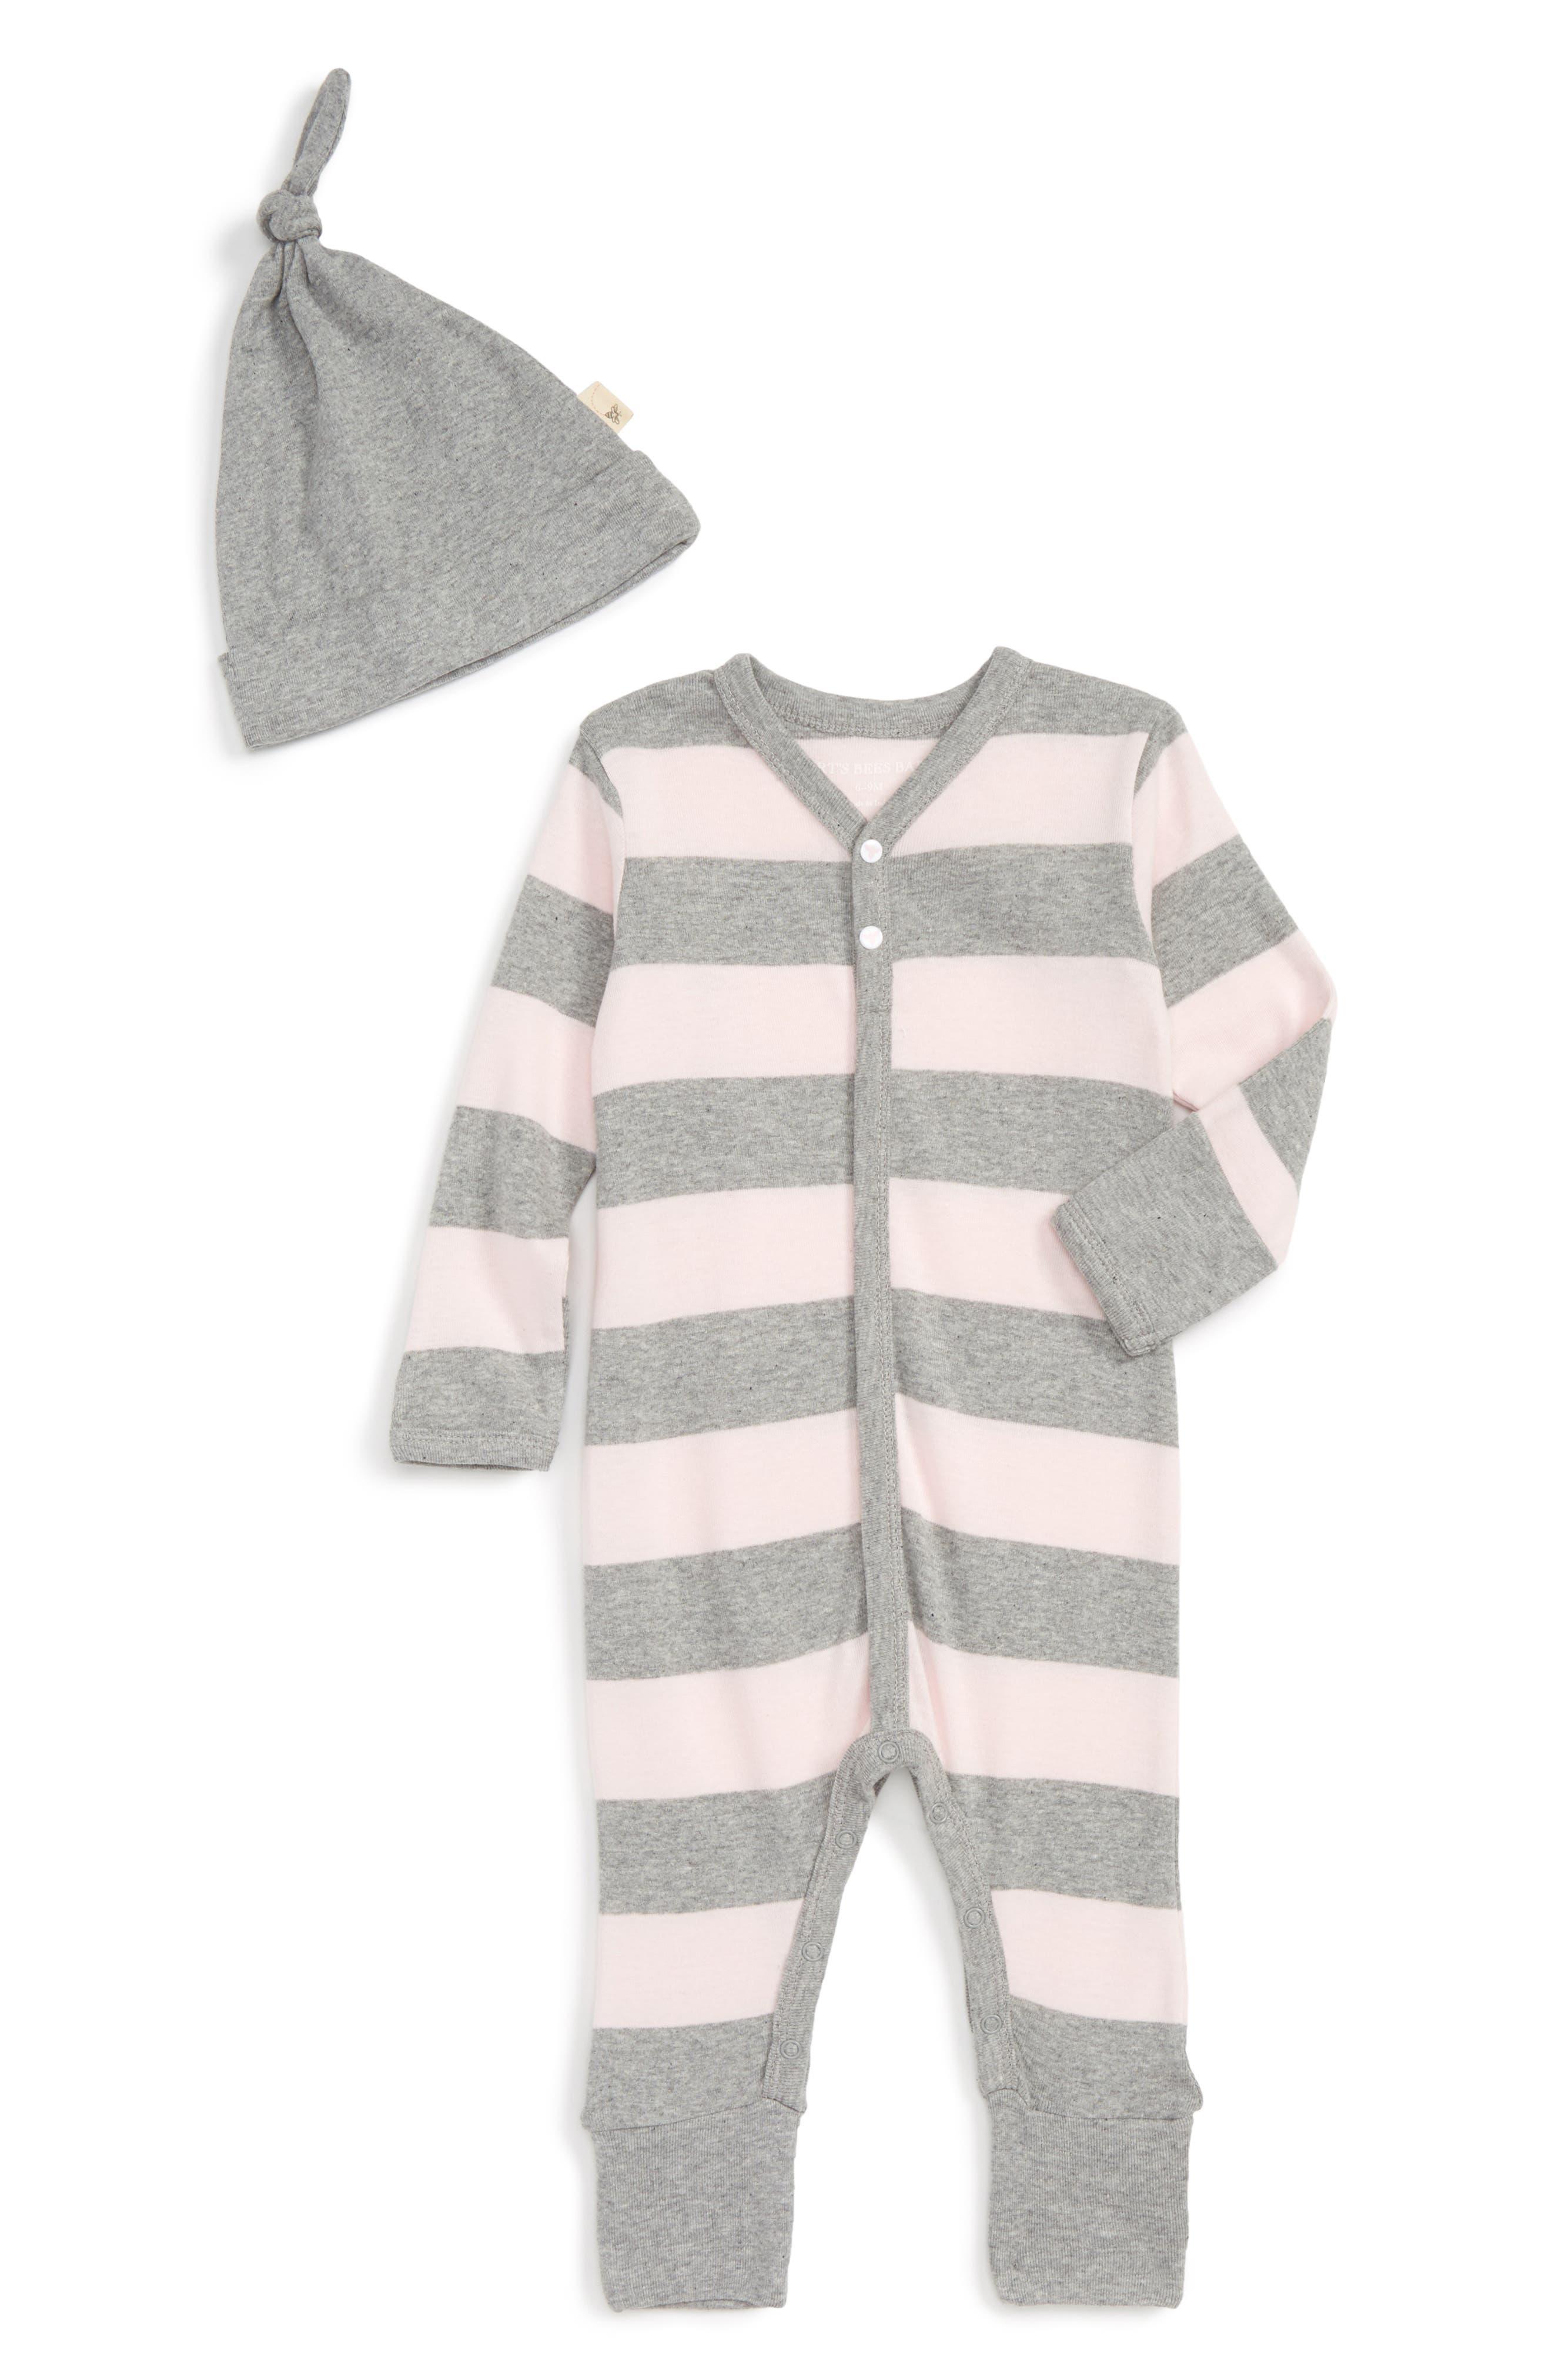 Burt's Bees Baby Stripe Organic Cotton Romper & Hat Set (Baby Girls)